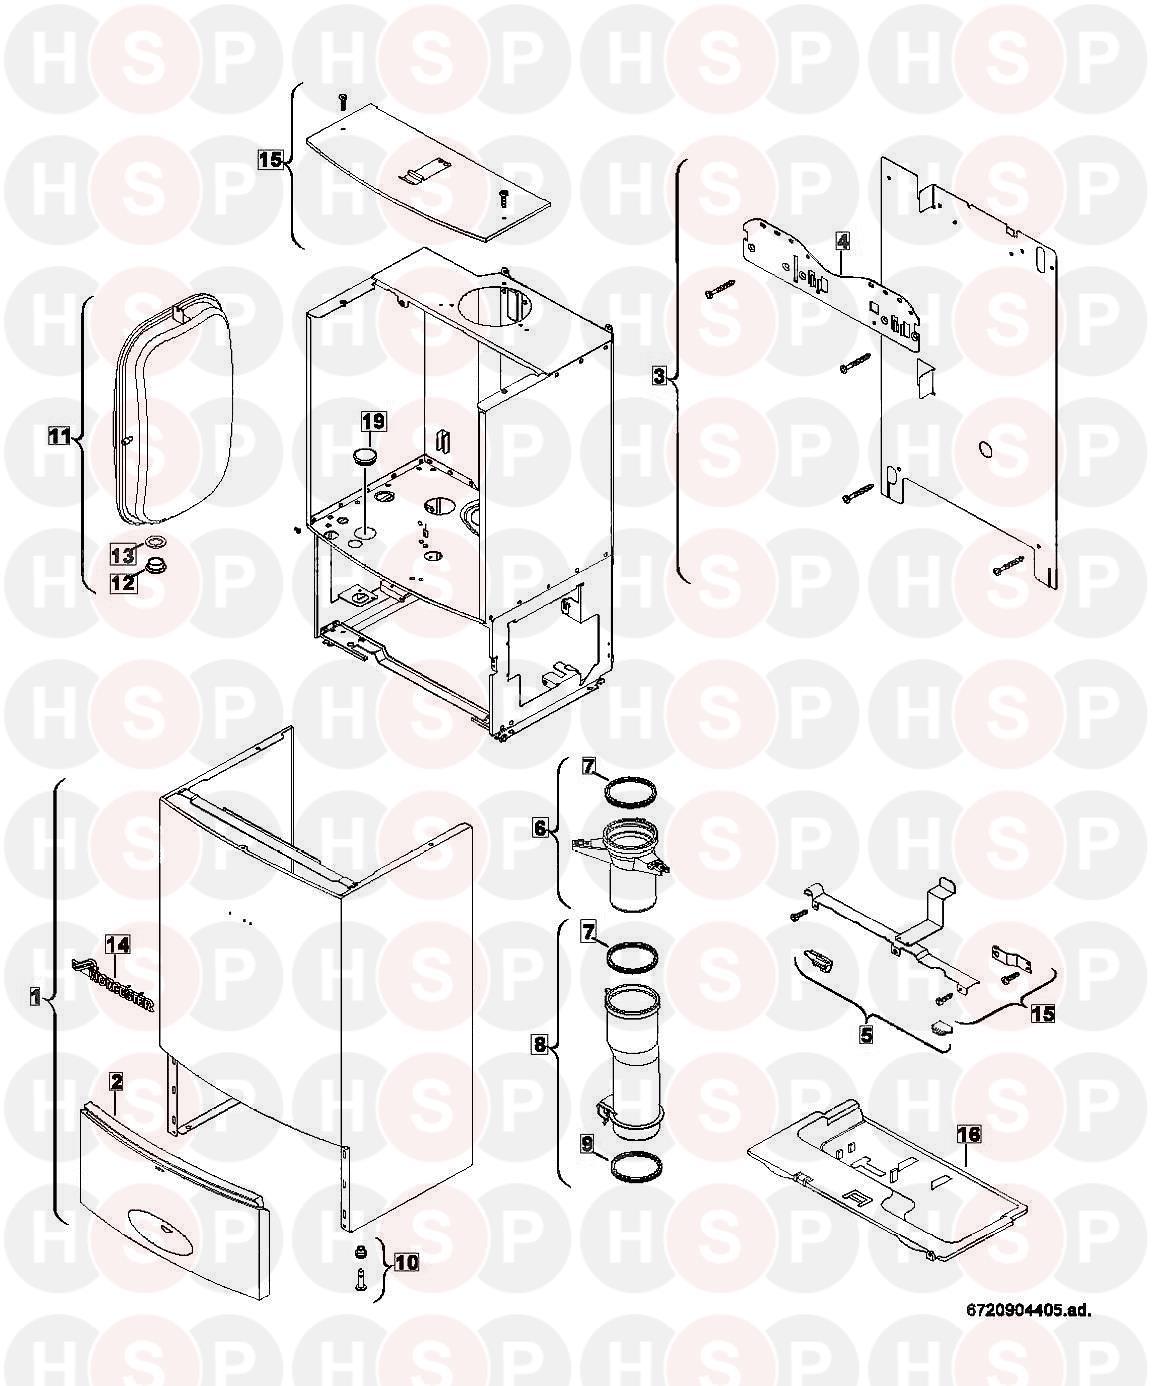 starion wiring diagram: worcester greenstar 40 cdi classic regular erp  (sheet